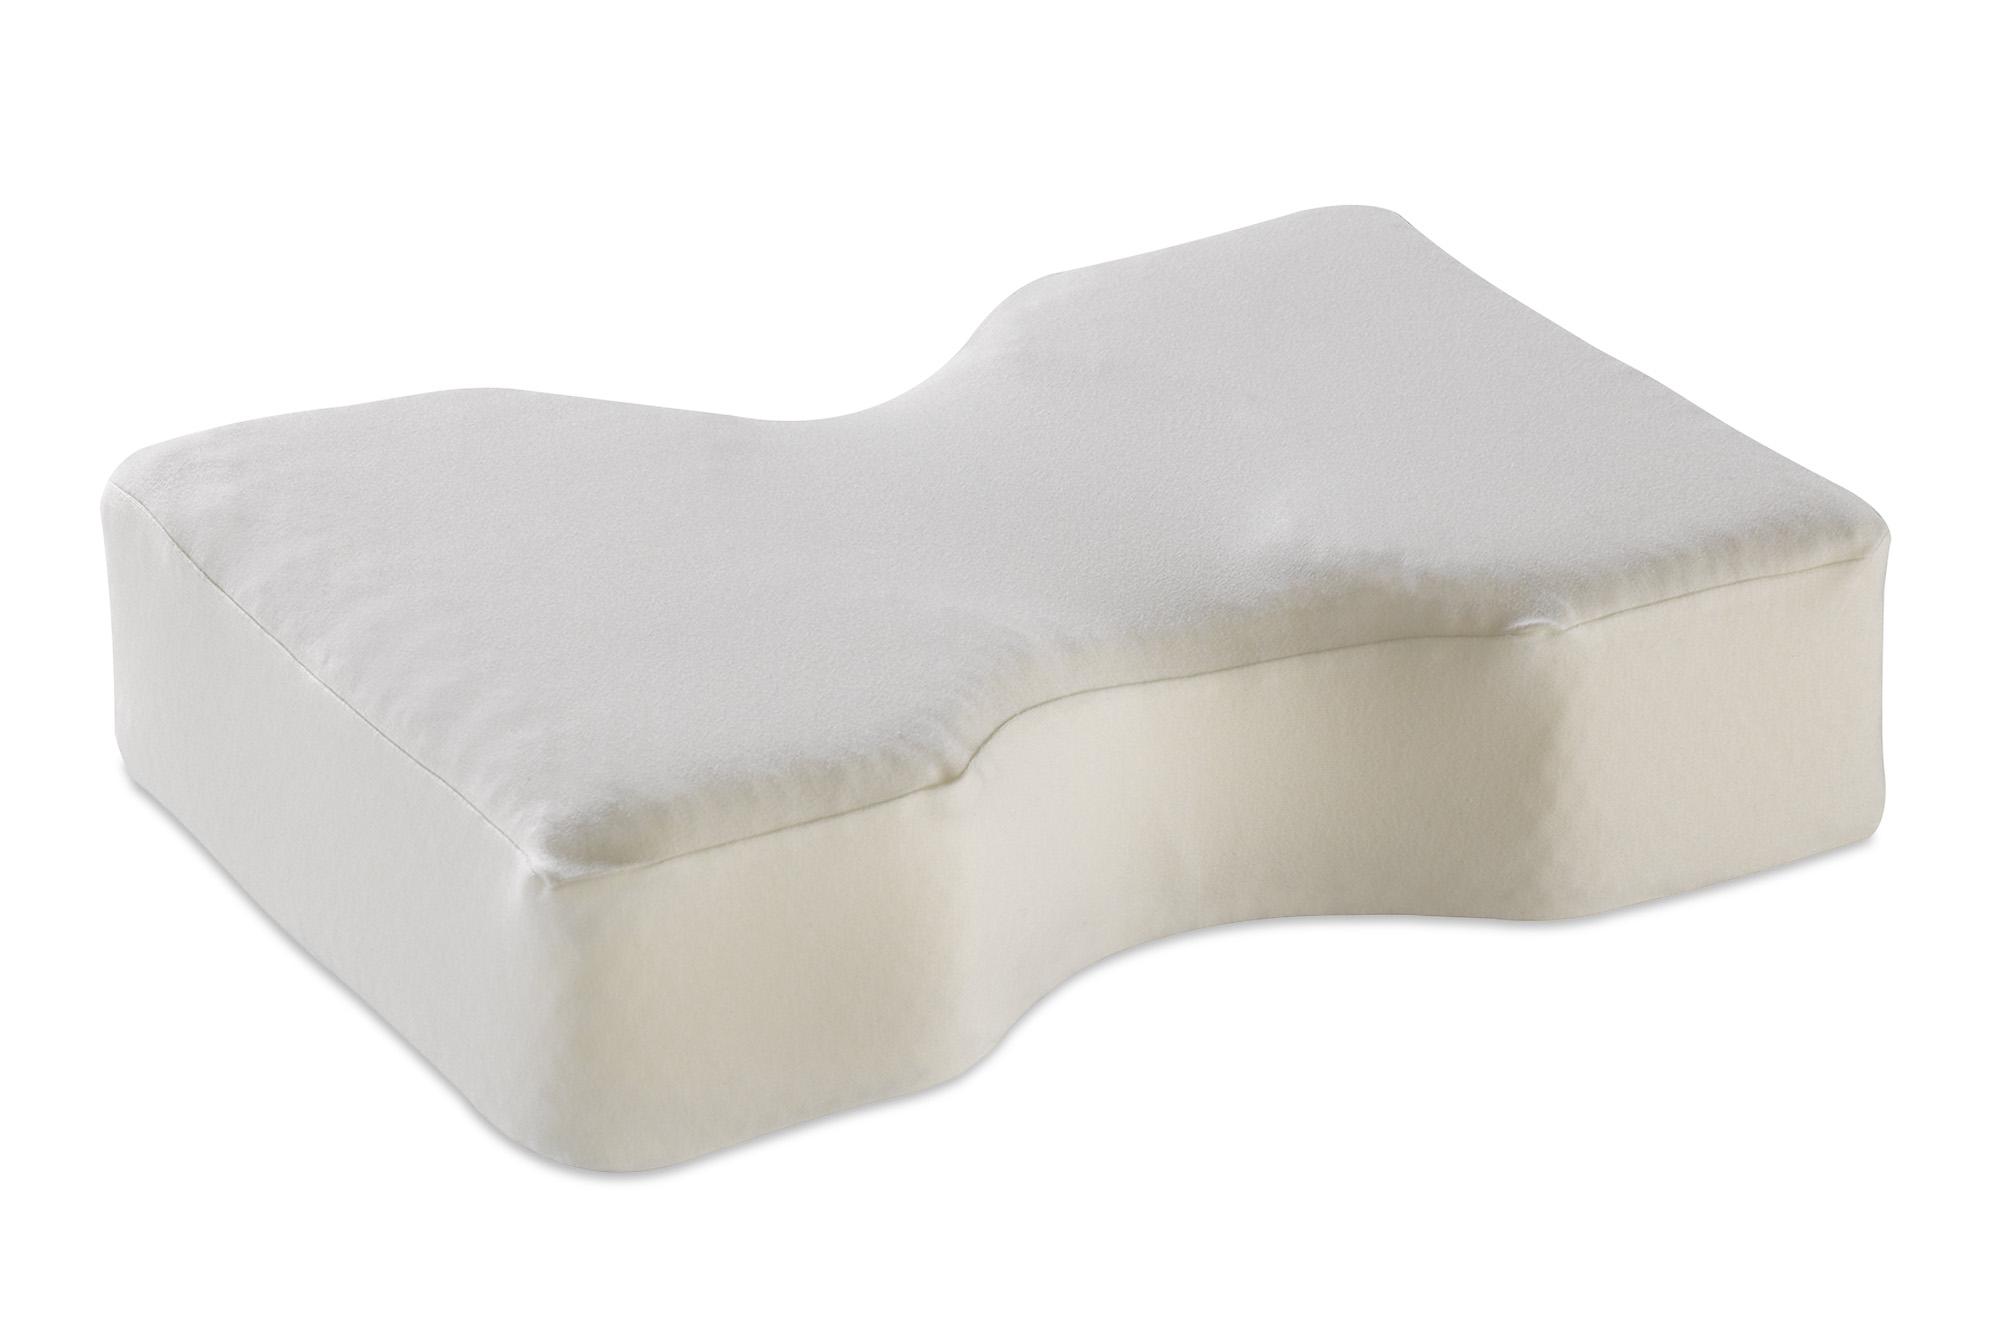 Sanapur Kopfkissenbezug Natur-Beige 100% Baumwolle